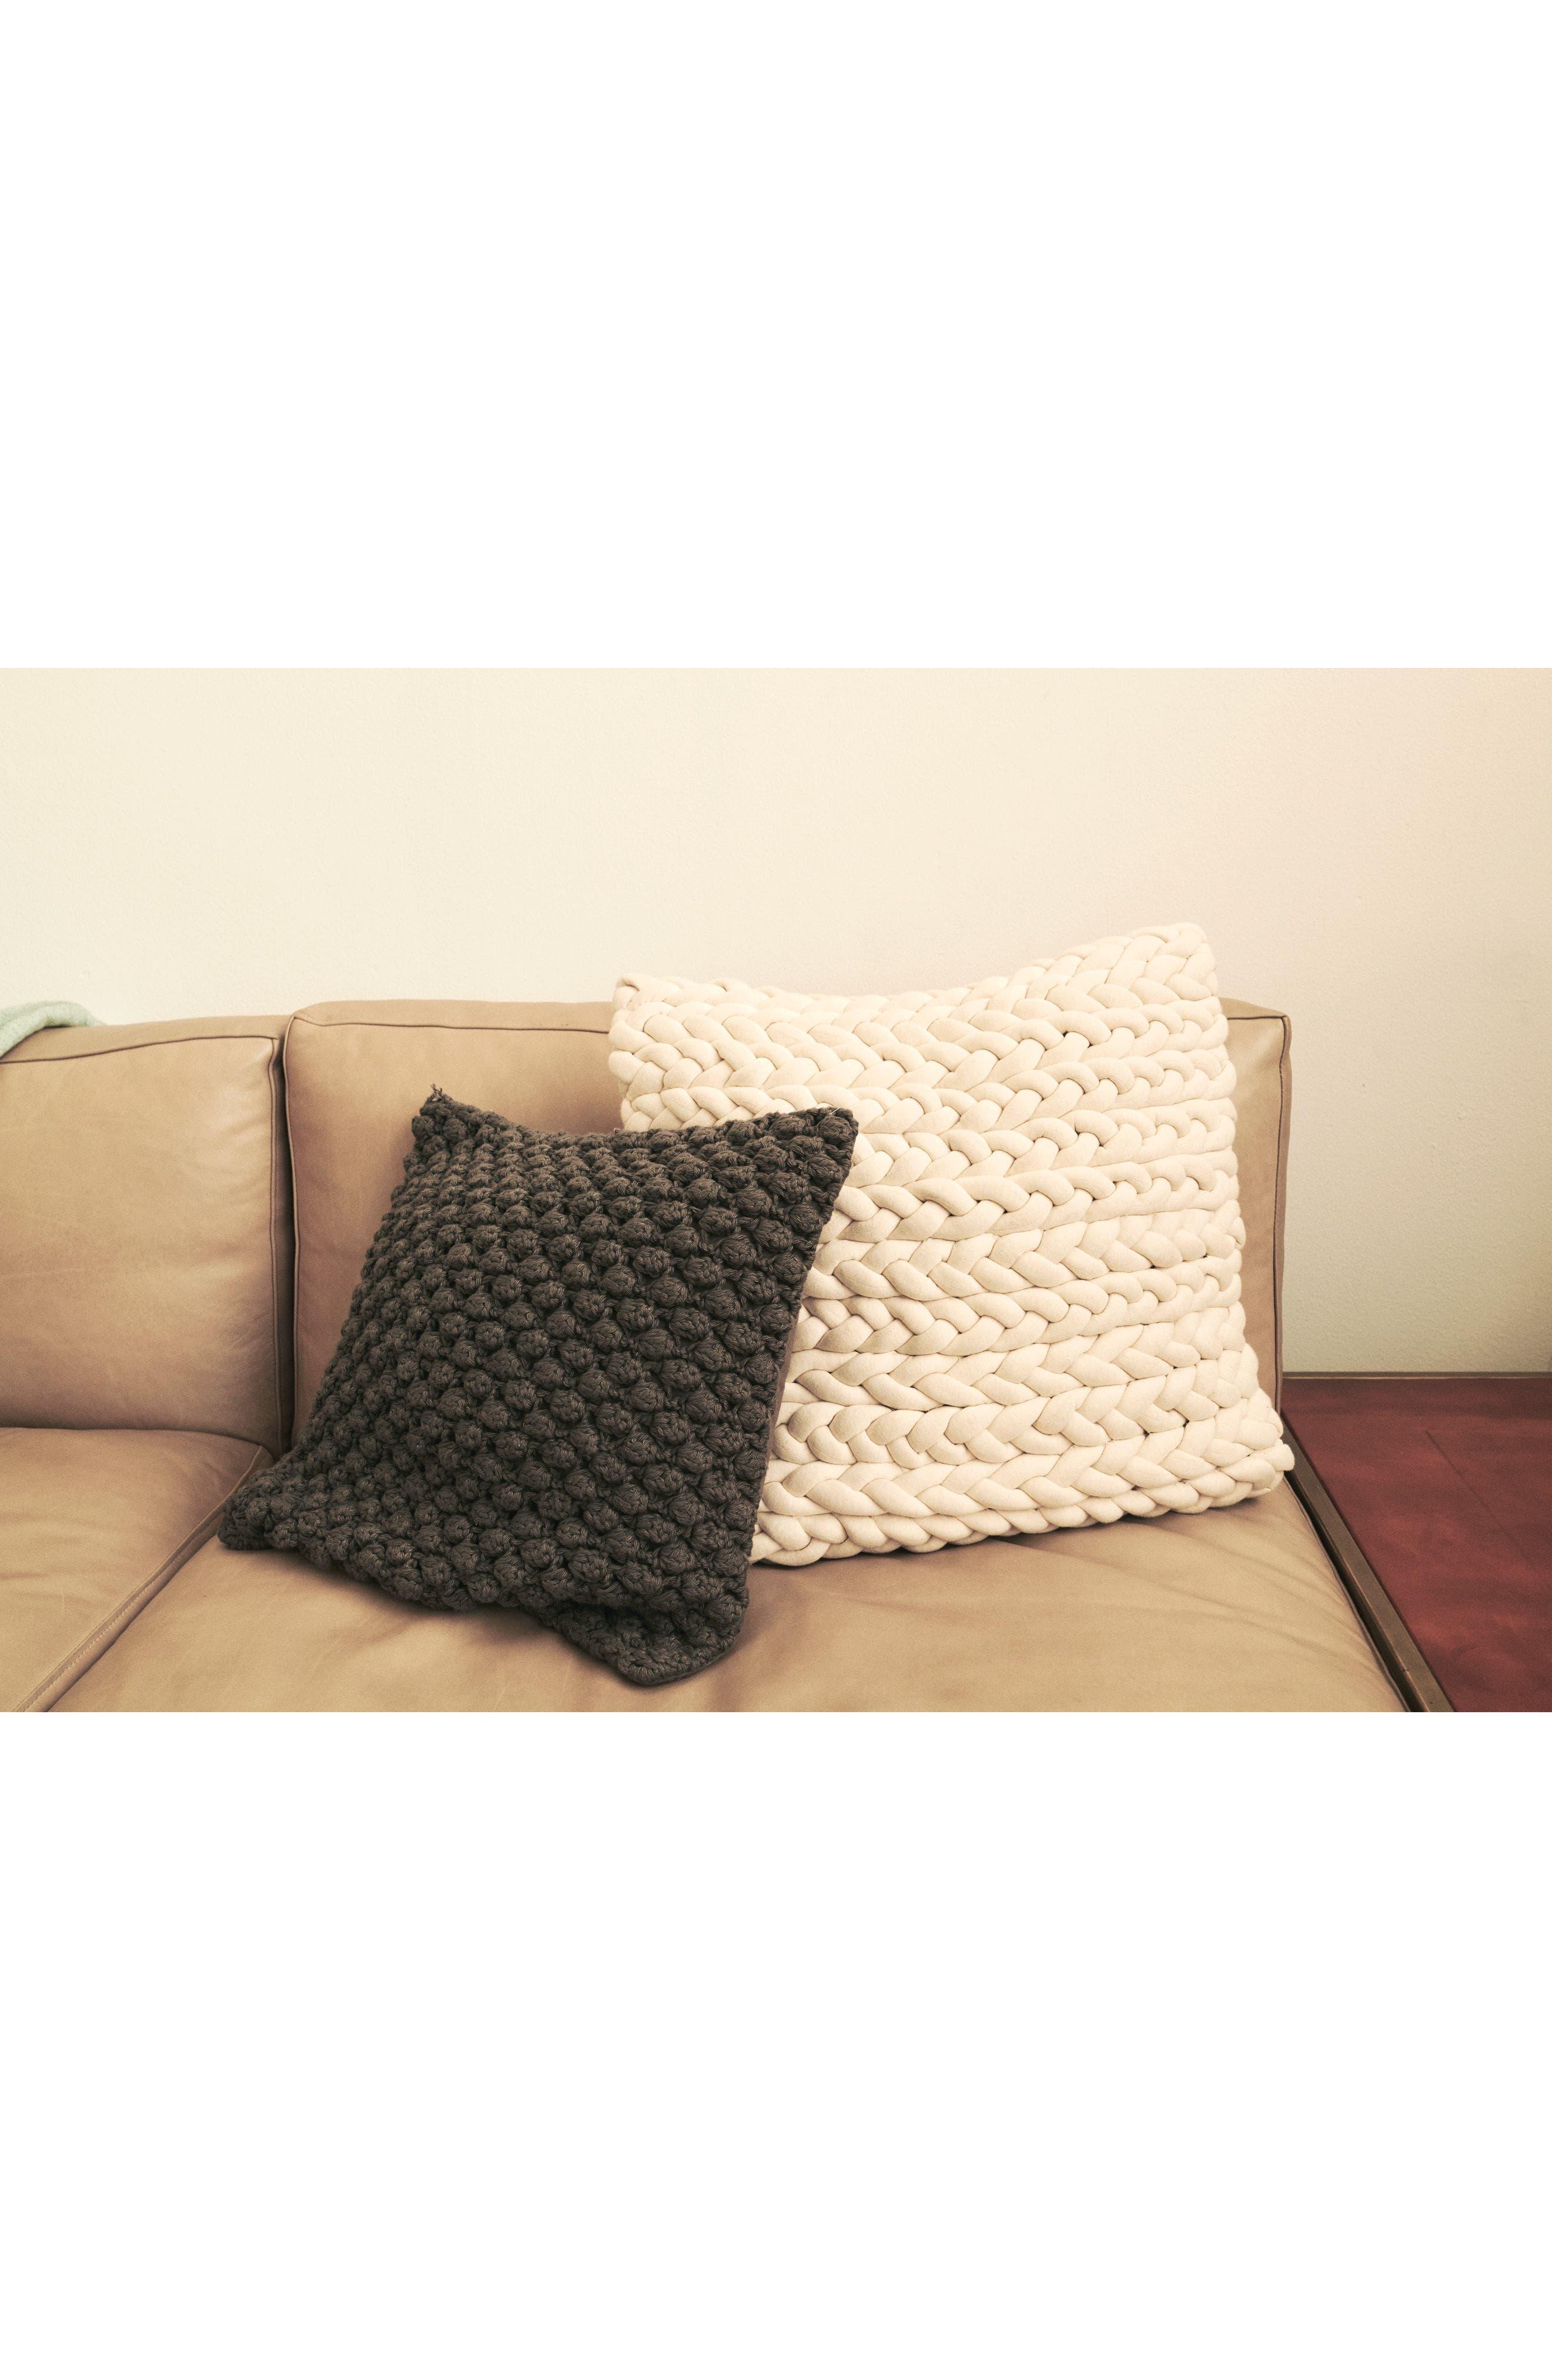 Pebble Knit Accent Pillow,                             Alternate thumbnail 5, color,                             GREY ONYX